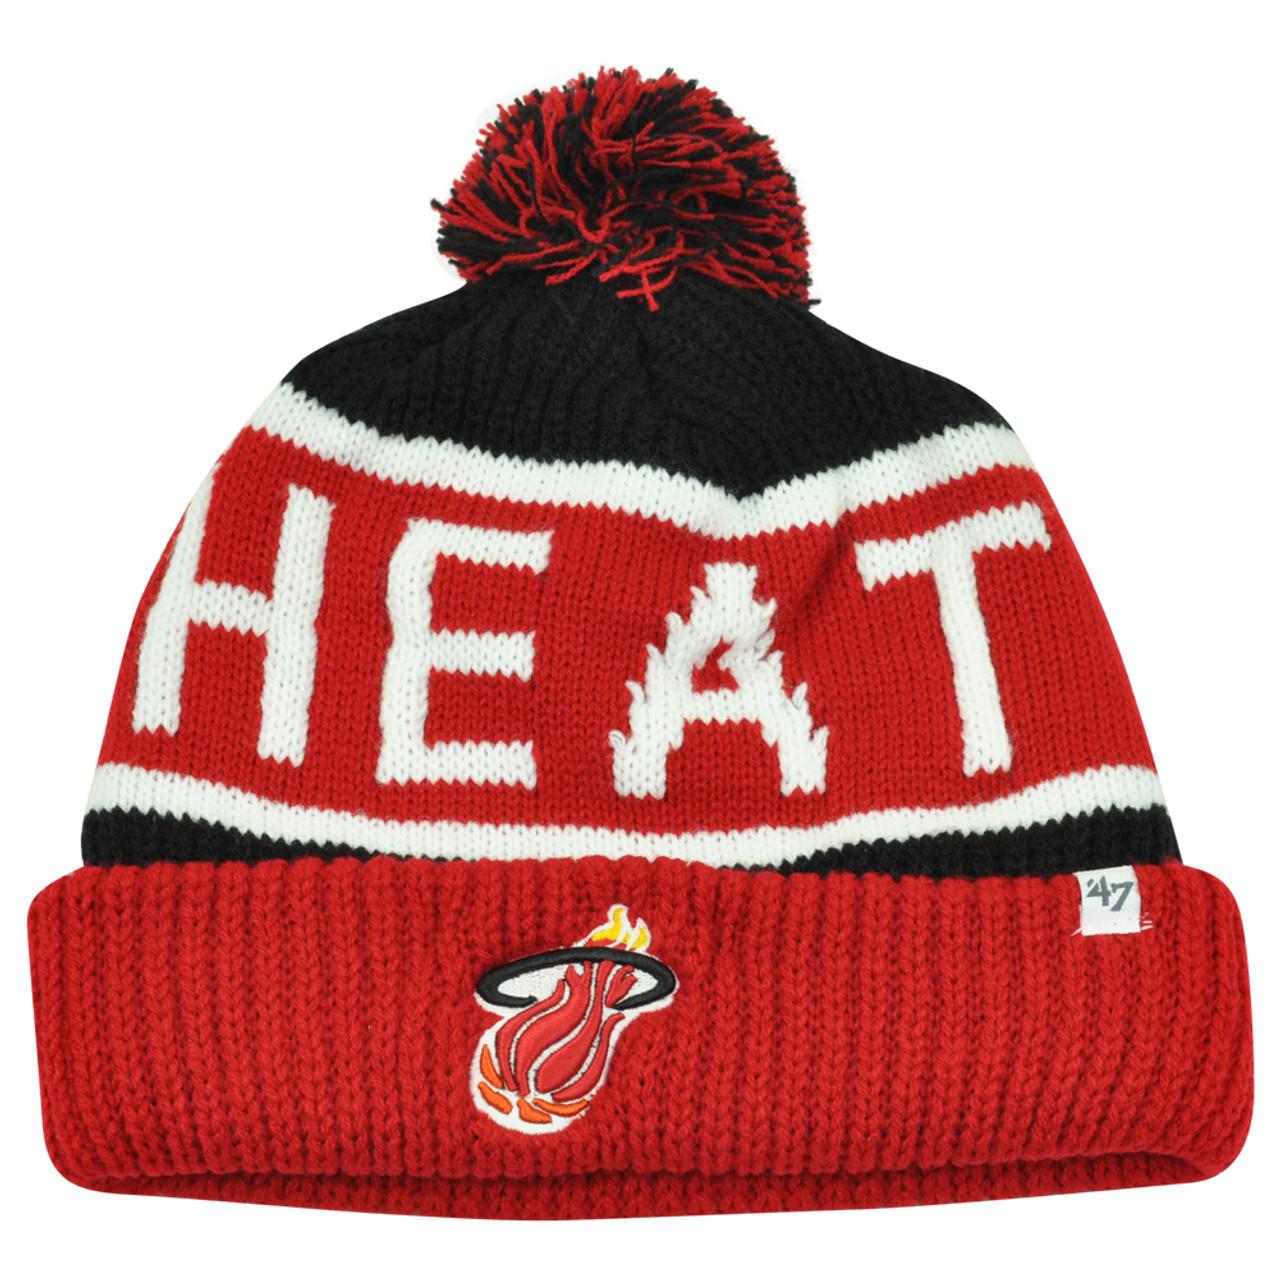 3b5983e3 NBA '47 Brand HWC Miami Heat Calgary Red Cuffed Pom Beanie Knit Toque  Skully Hat - Sinbad Sports Store